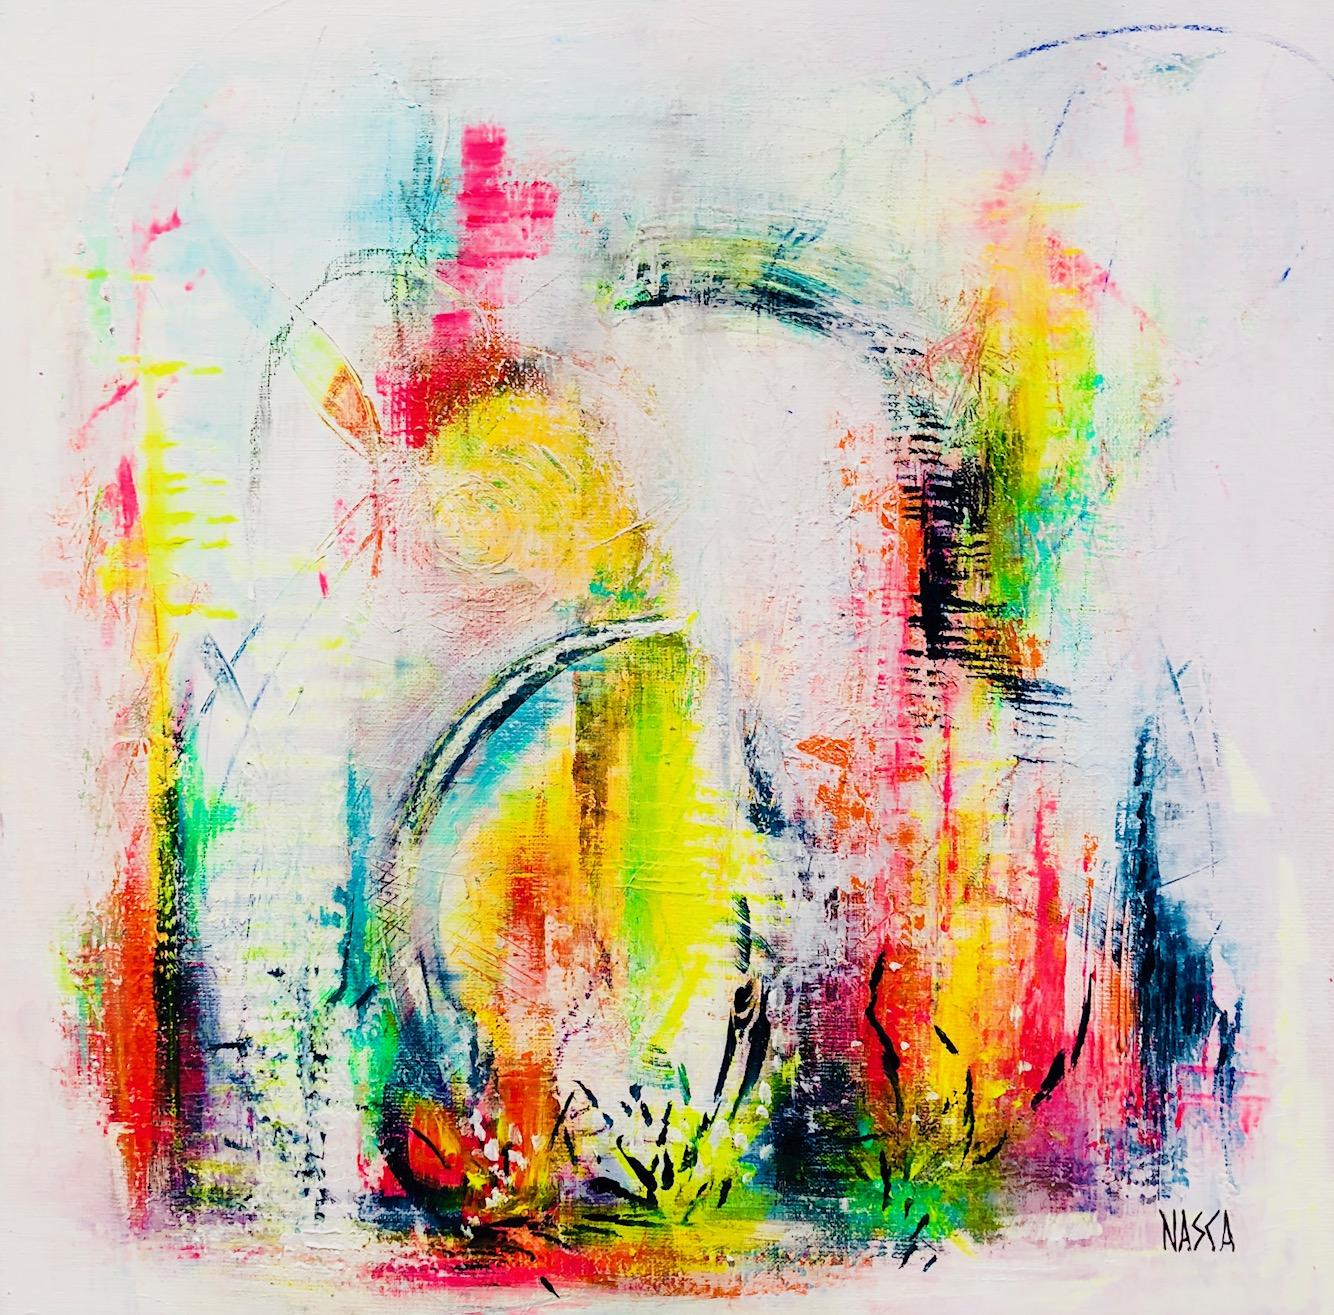 Effervescence (50x50)